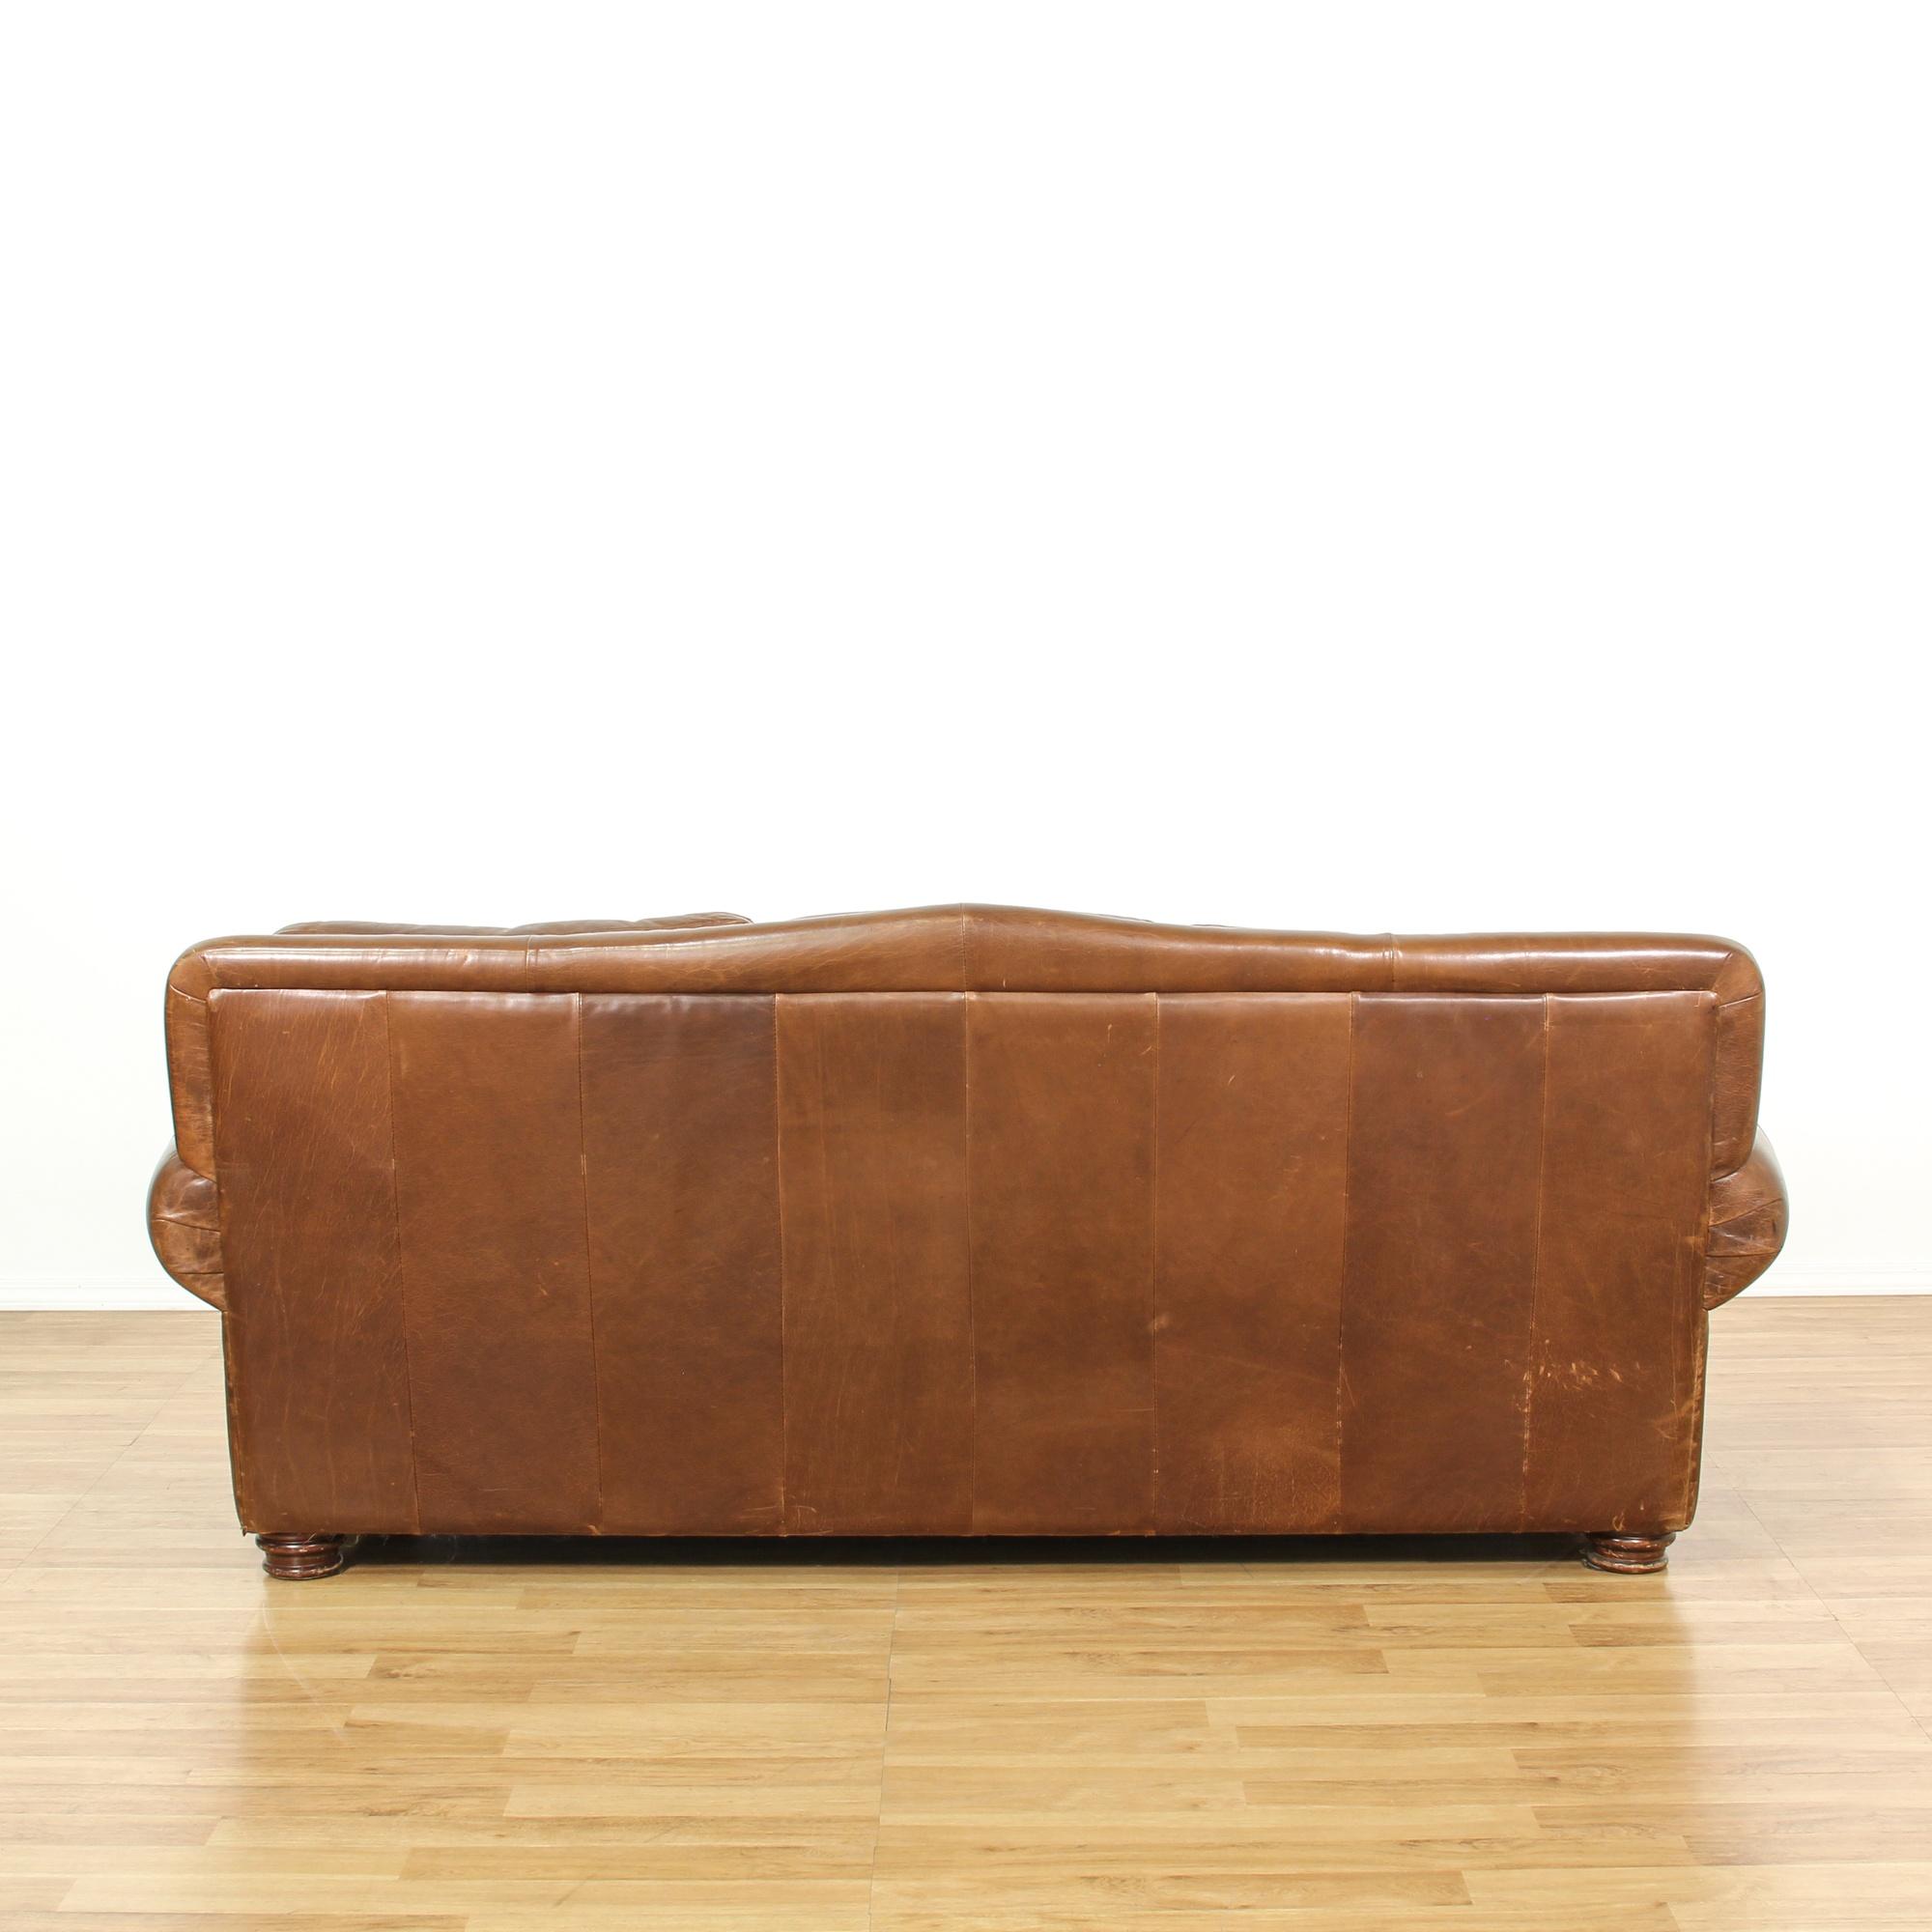 Ralph Lauren Style Leather Studded Sofa Loveseat Vintage Furniture San Diego Los Angeles